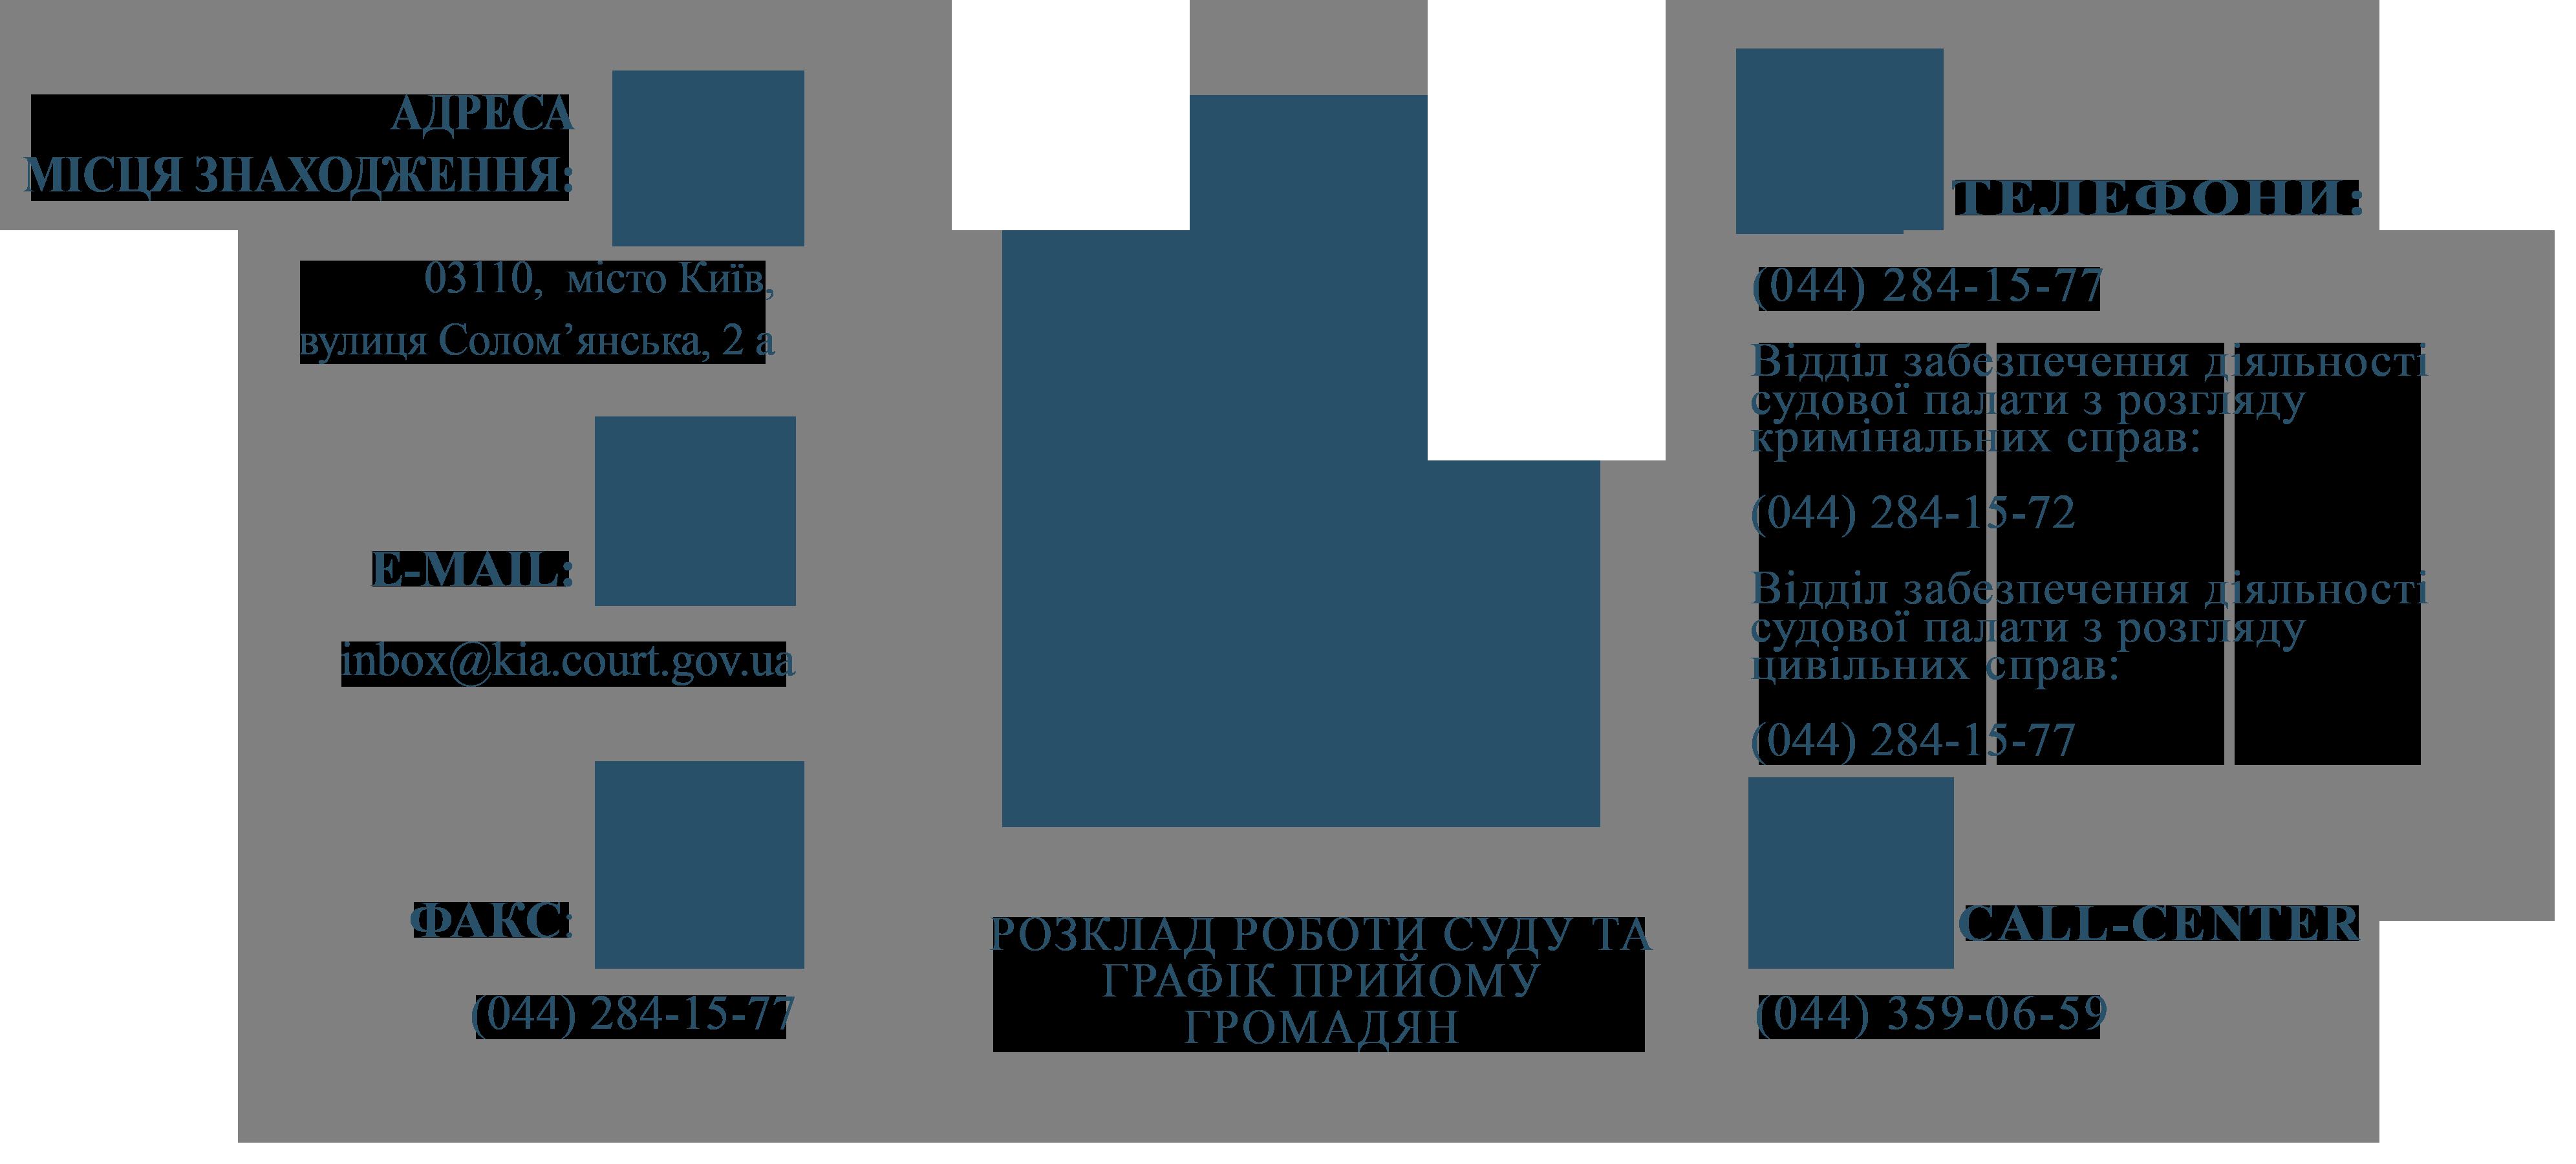 contact ukr 170820